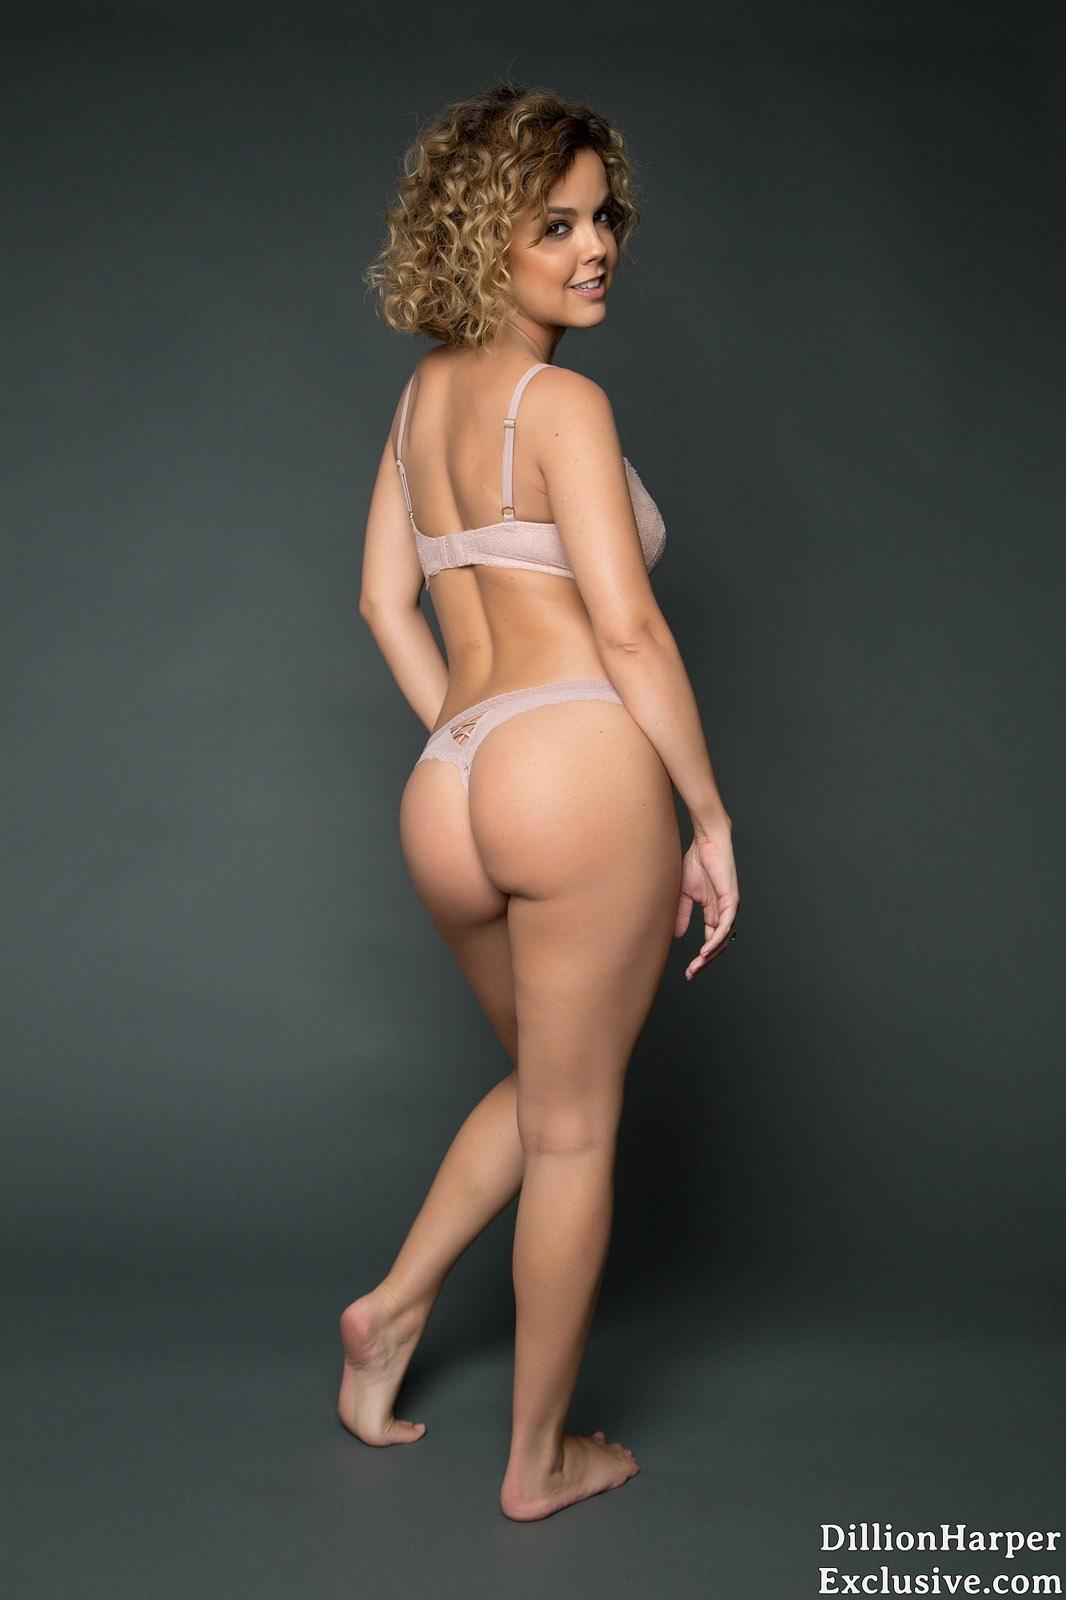 Dillion Harper Bra And Panties